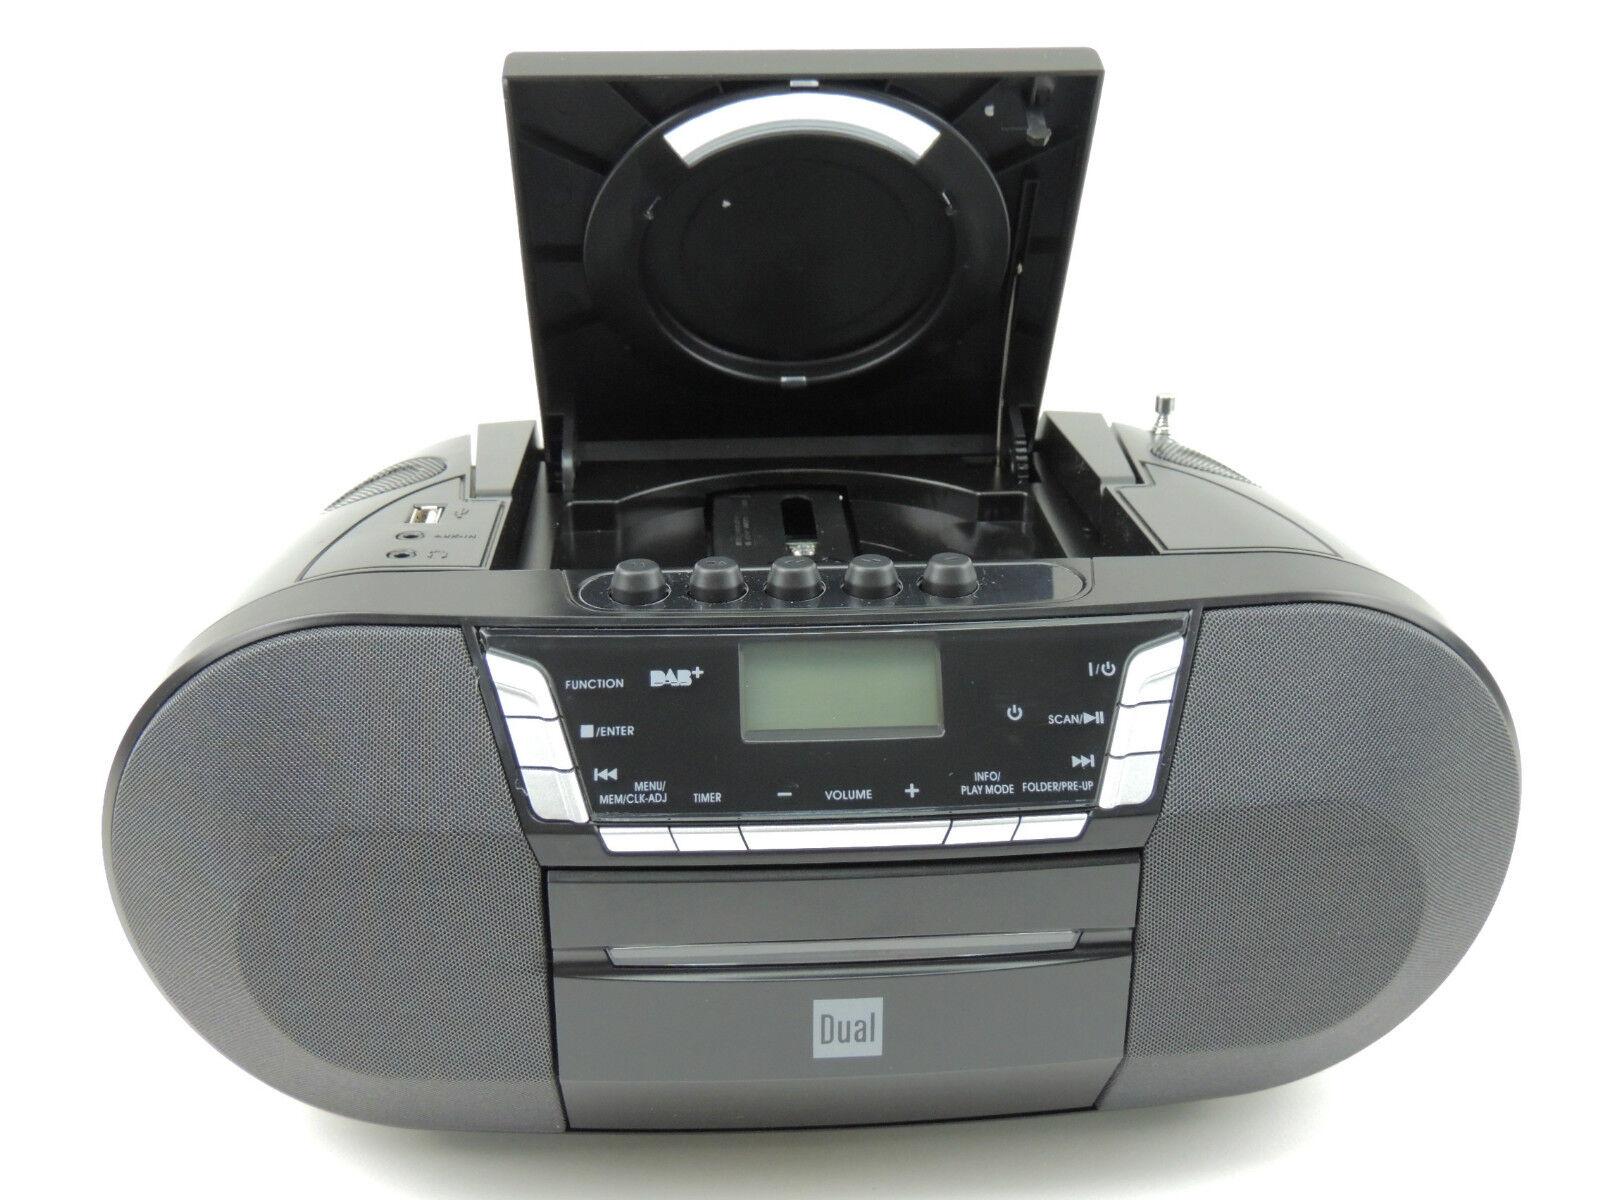 dual dab p 200 aux cd radio dab digital radio ukw. Black Bedroom Furniture Sets. Home Design Ideas